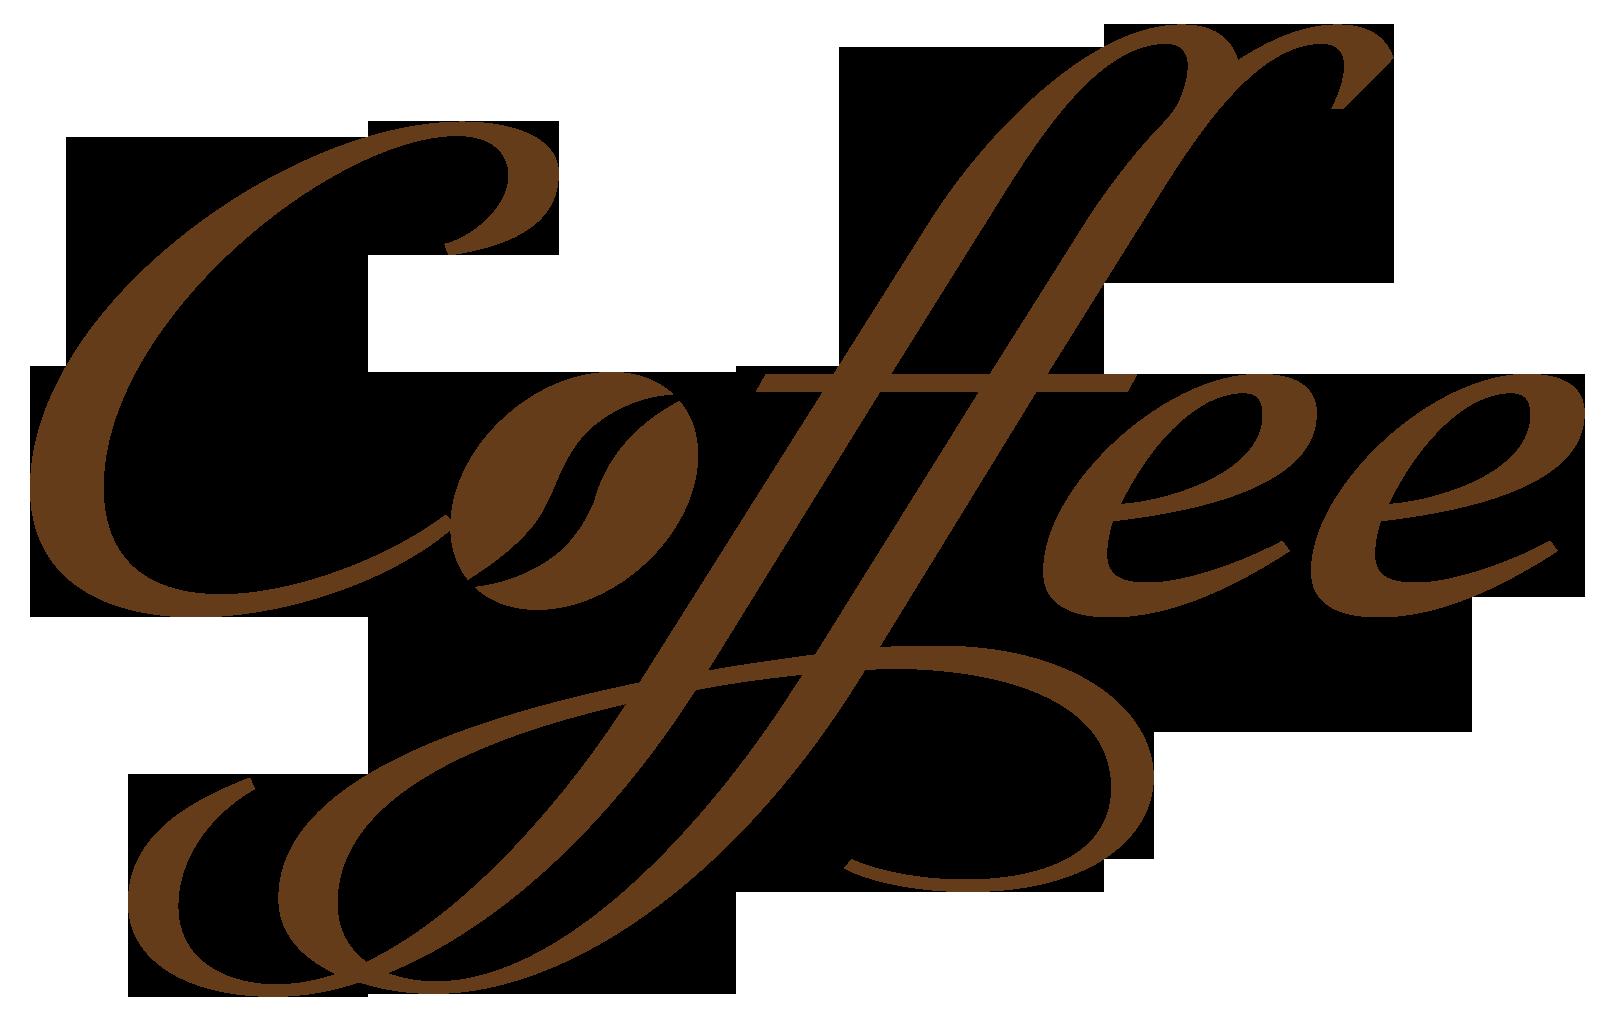 coffee can clip art - photo #44